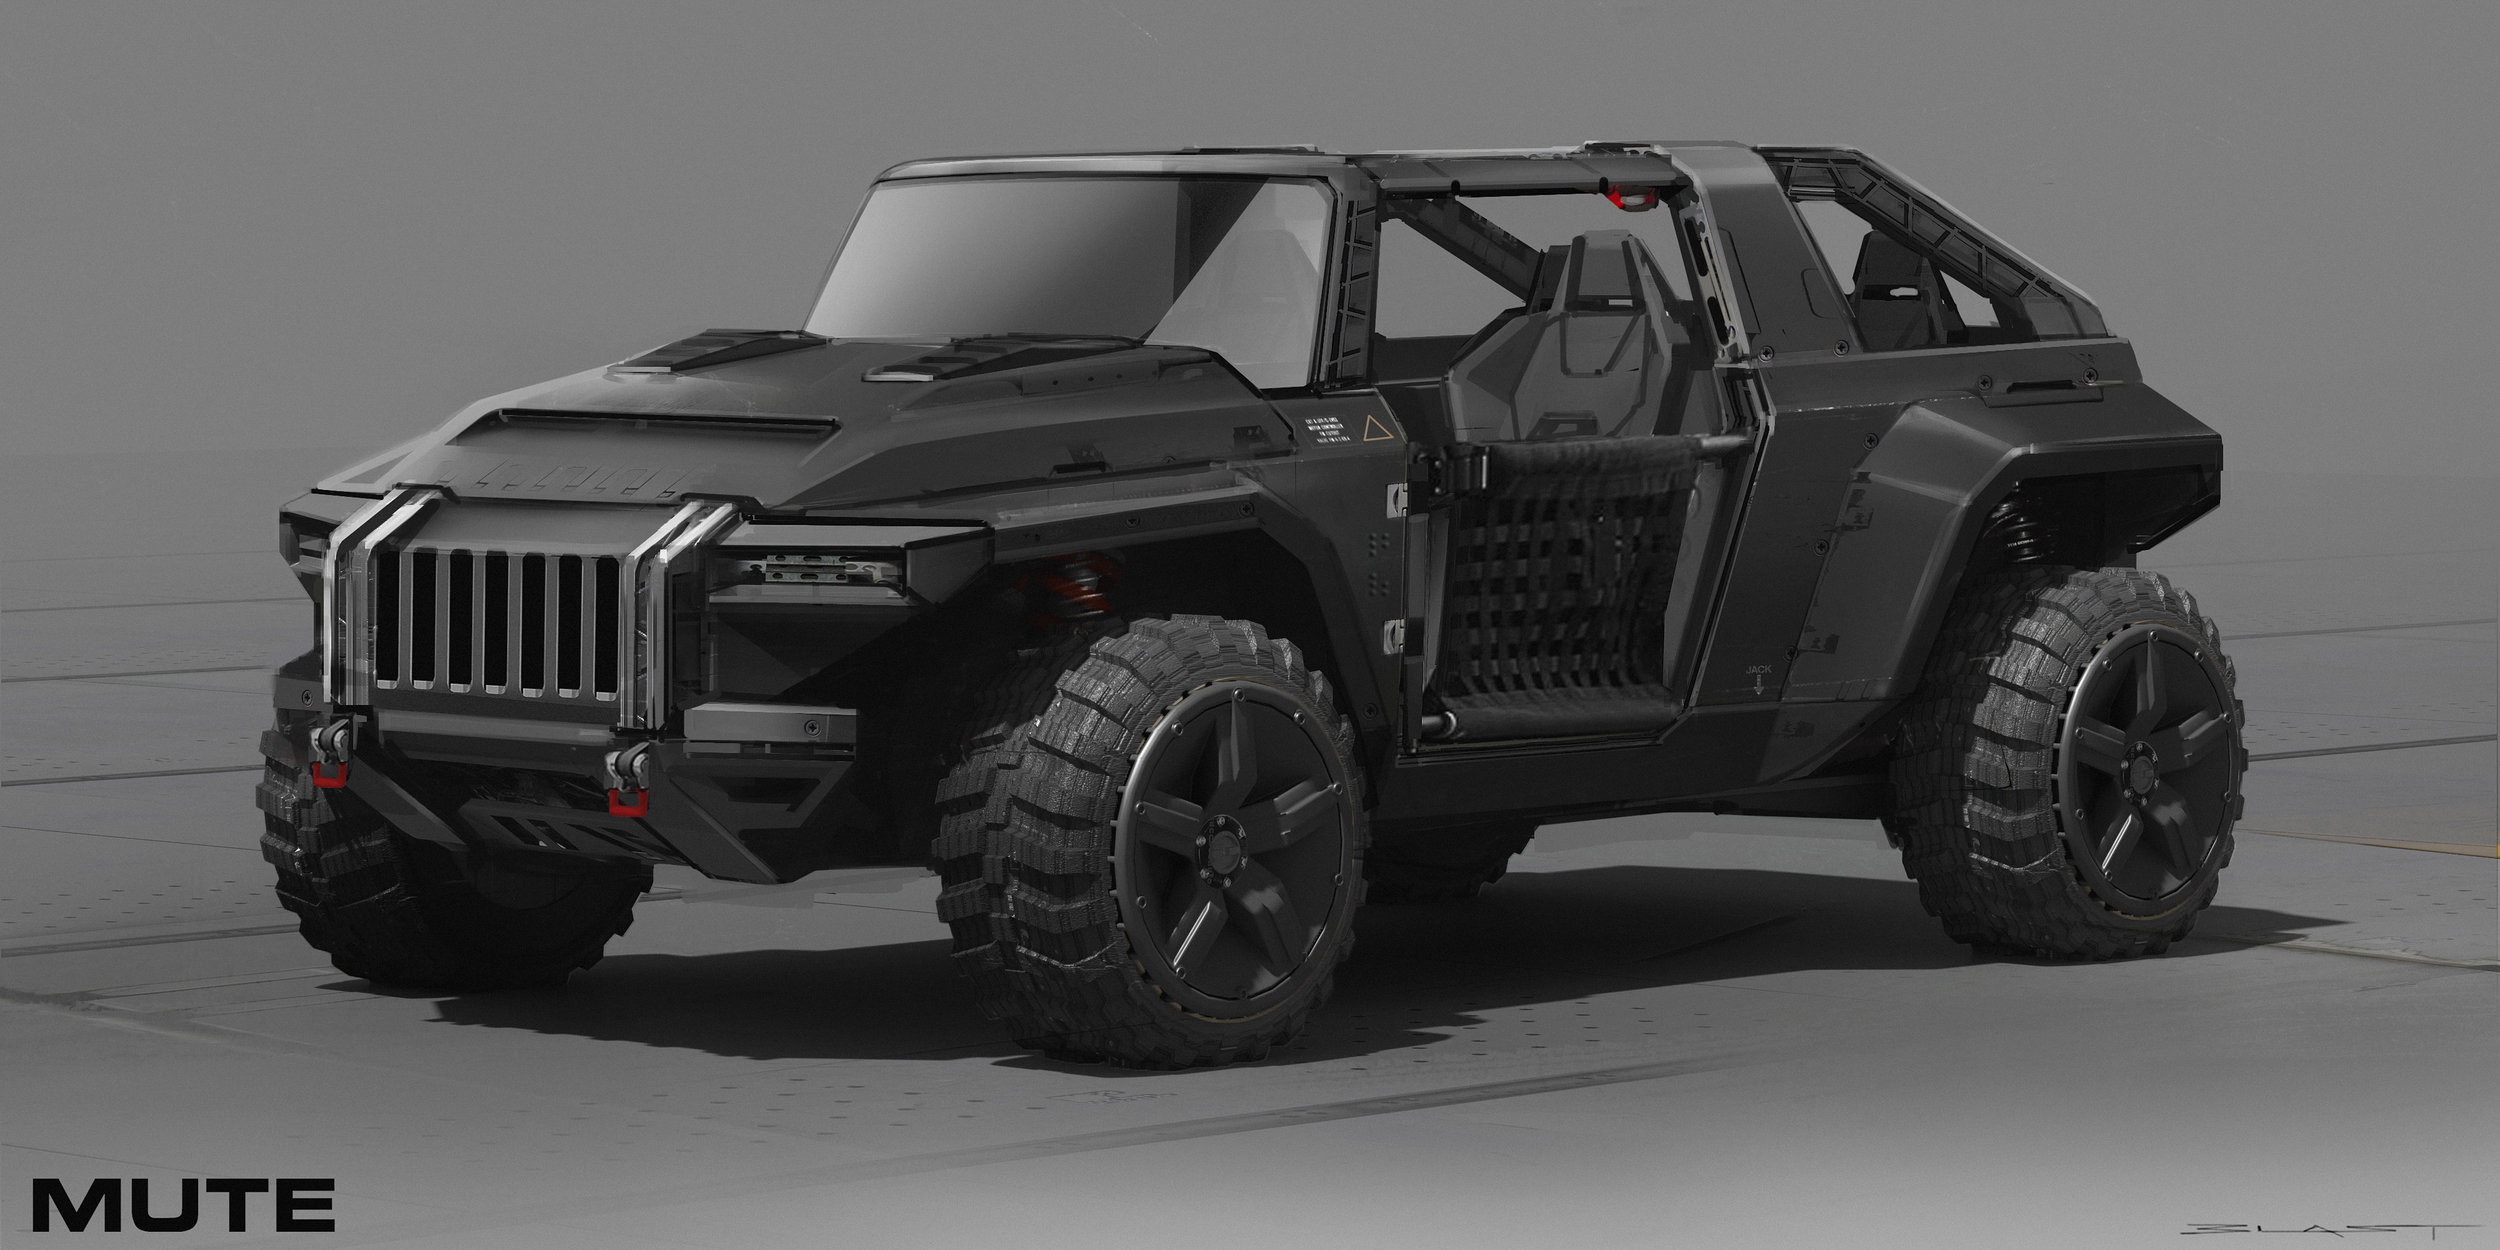 MUTE_jeepfrontblack_blast.jpg